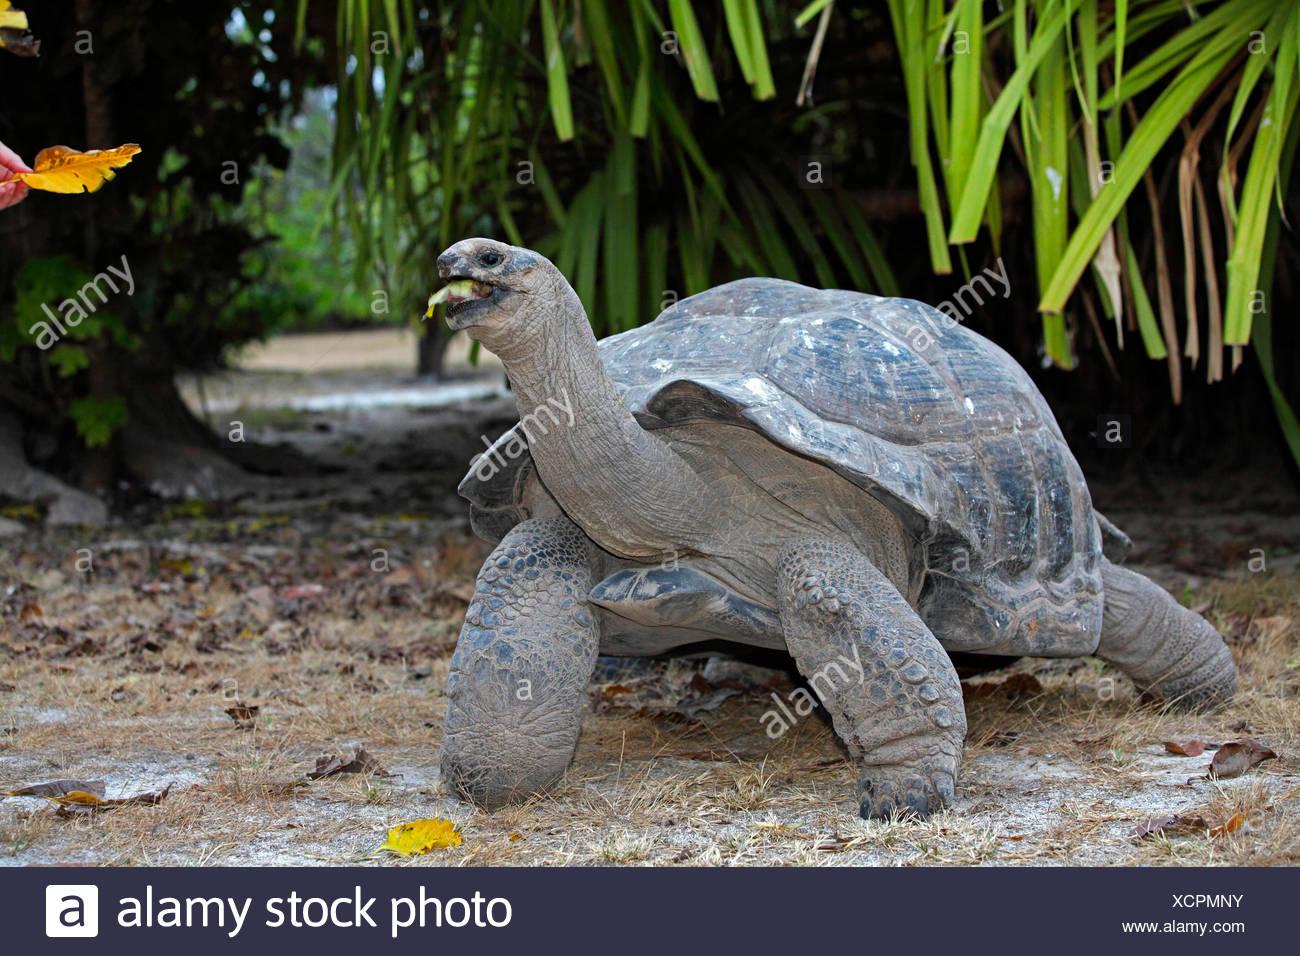 Seychelles giant tortoise, Aldabran giant tortoise, Aldabra giant tortoise (Aldabrachelys gigantea, Testudo gigantea, Geochelone gigantea, Megalochelys gigantea), feeding  leaves, Seychelles, Bird Island - Stock Image